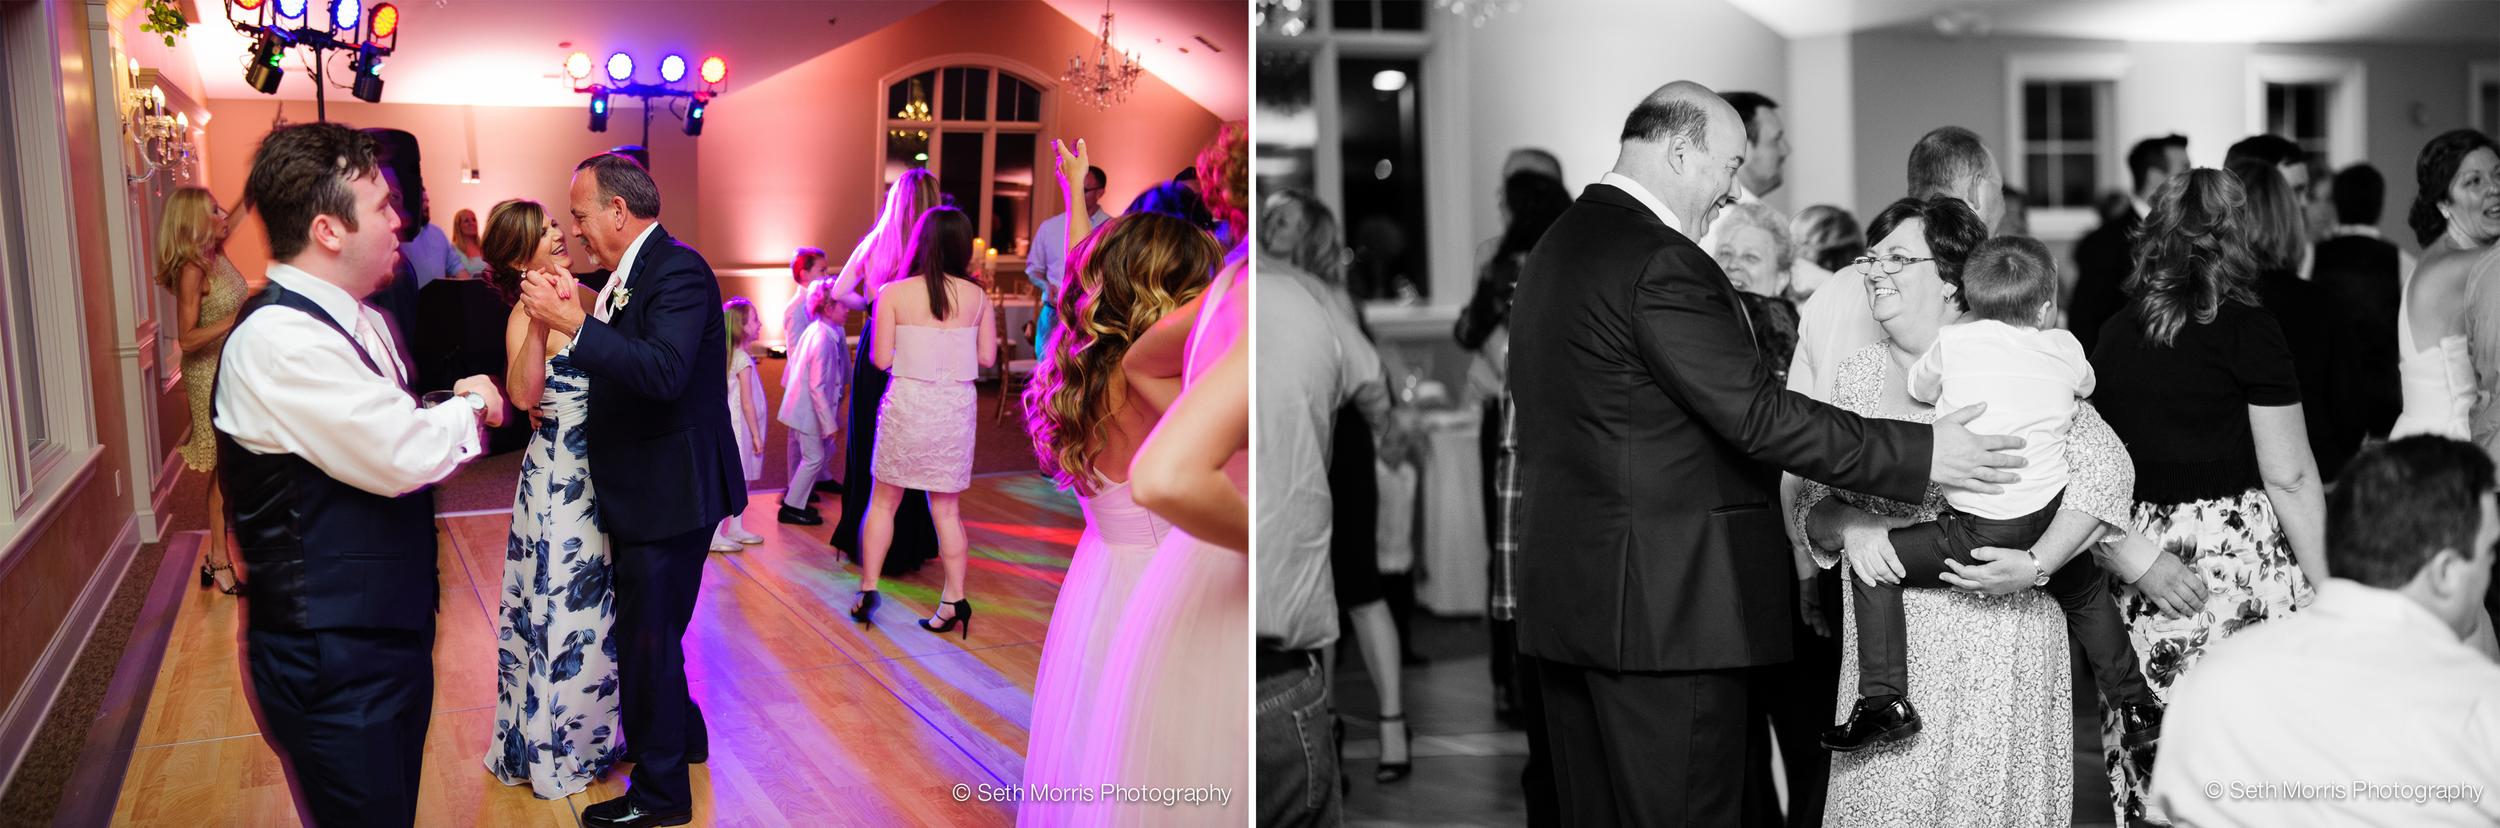 metamora-fields-wedding-photographer-peoria-189.jpg